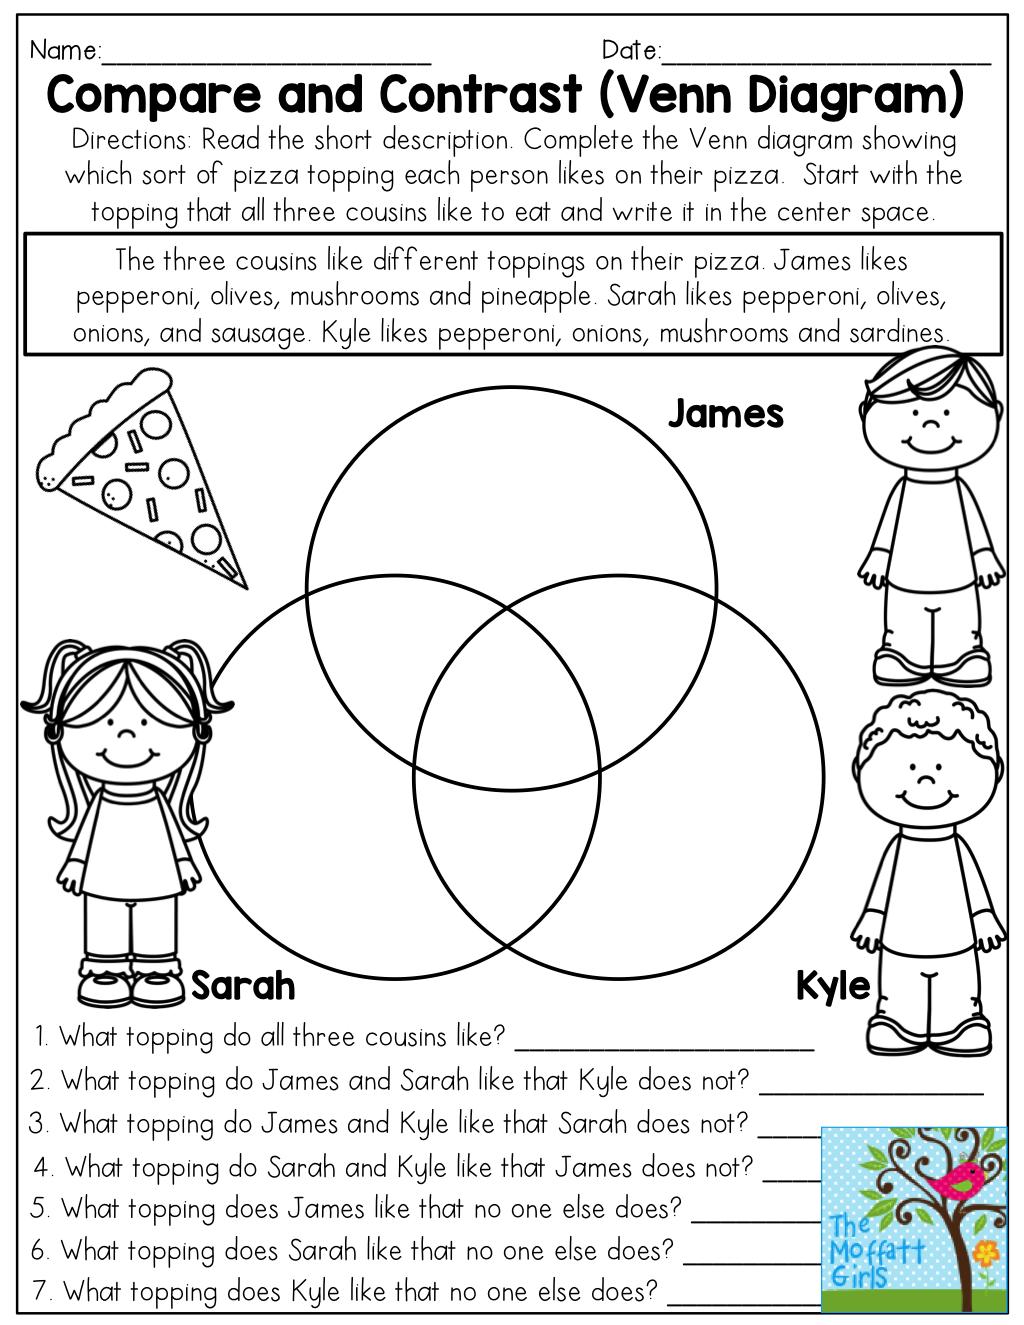 medium resolution of Compare and Contrast (Venn Diagram) 3 Things- Read the short description